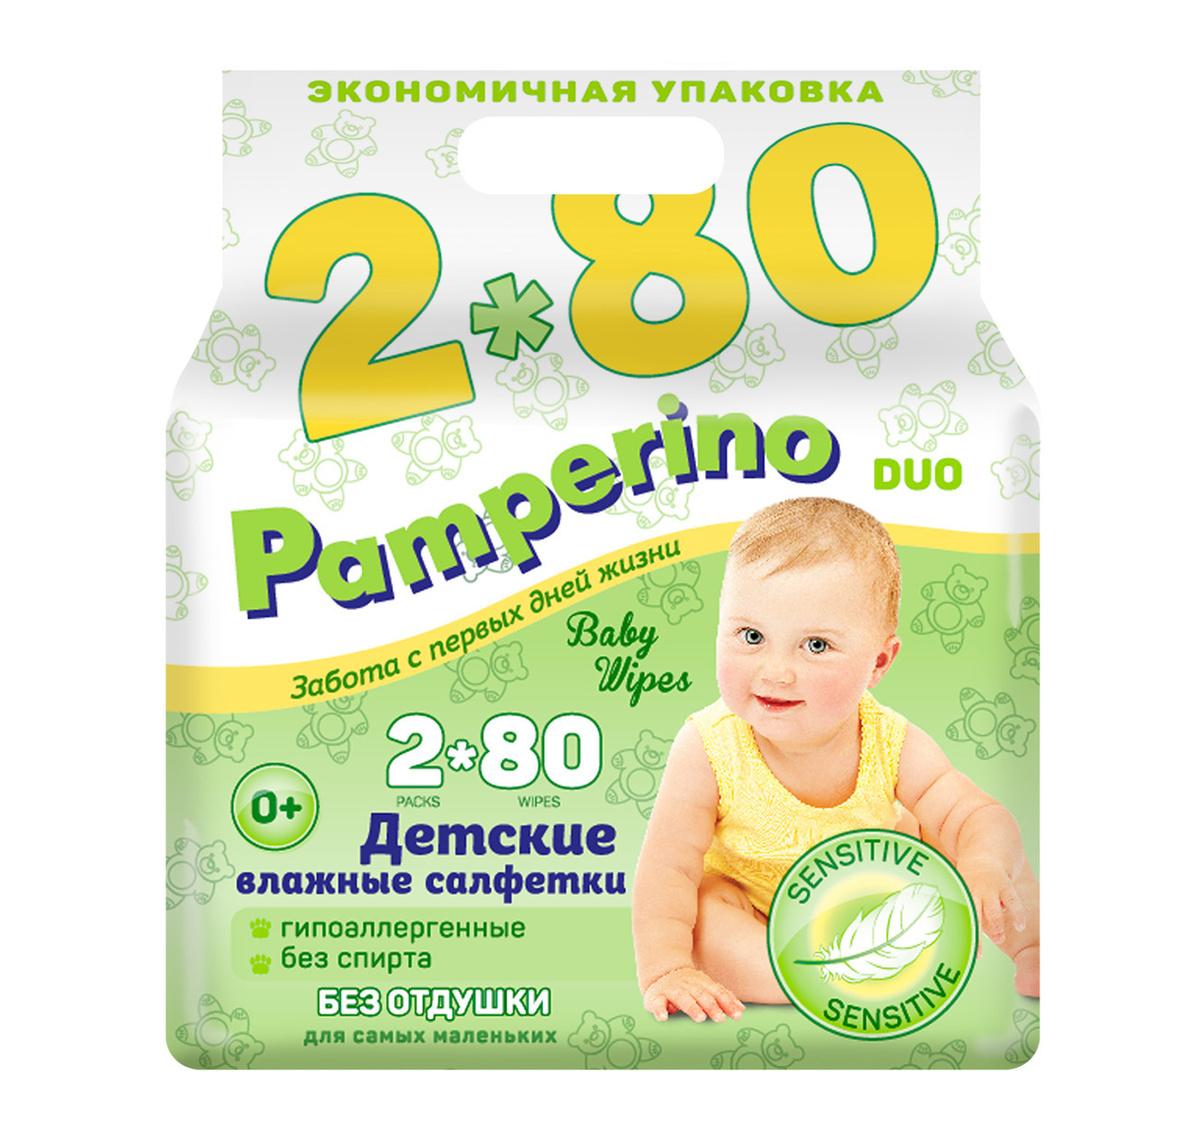 Pamperino/Влажные салфетки детские №80 БЕЗ ОТДУШКИ, набор из 2 х упаковок  #1